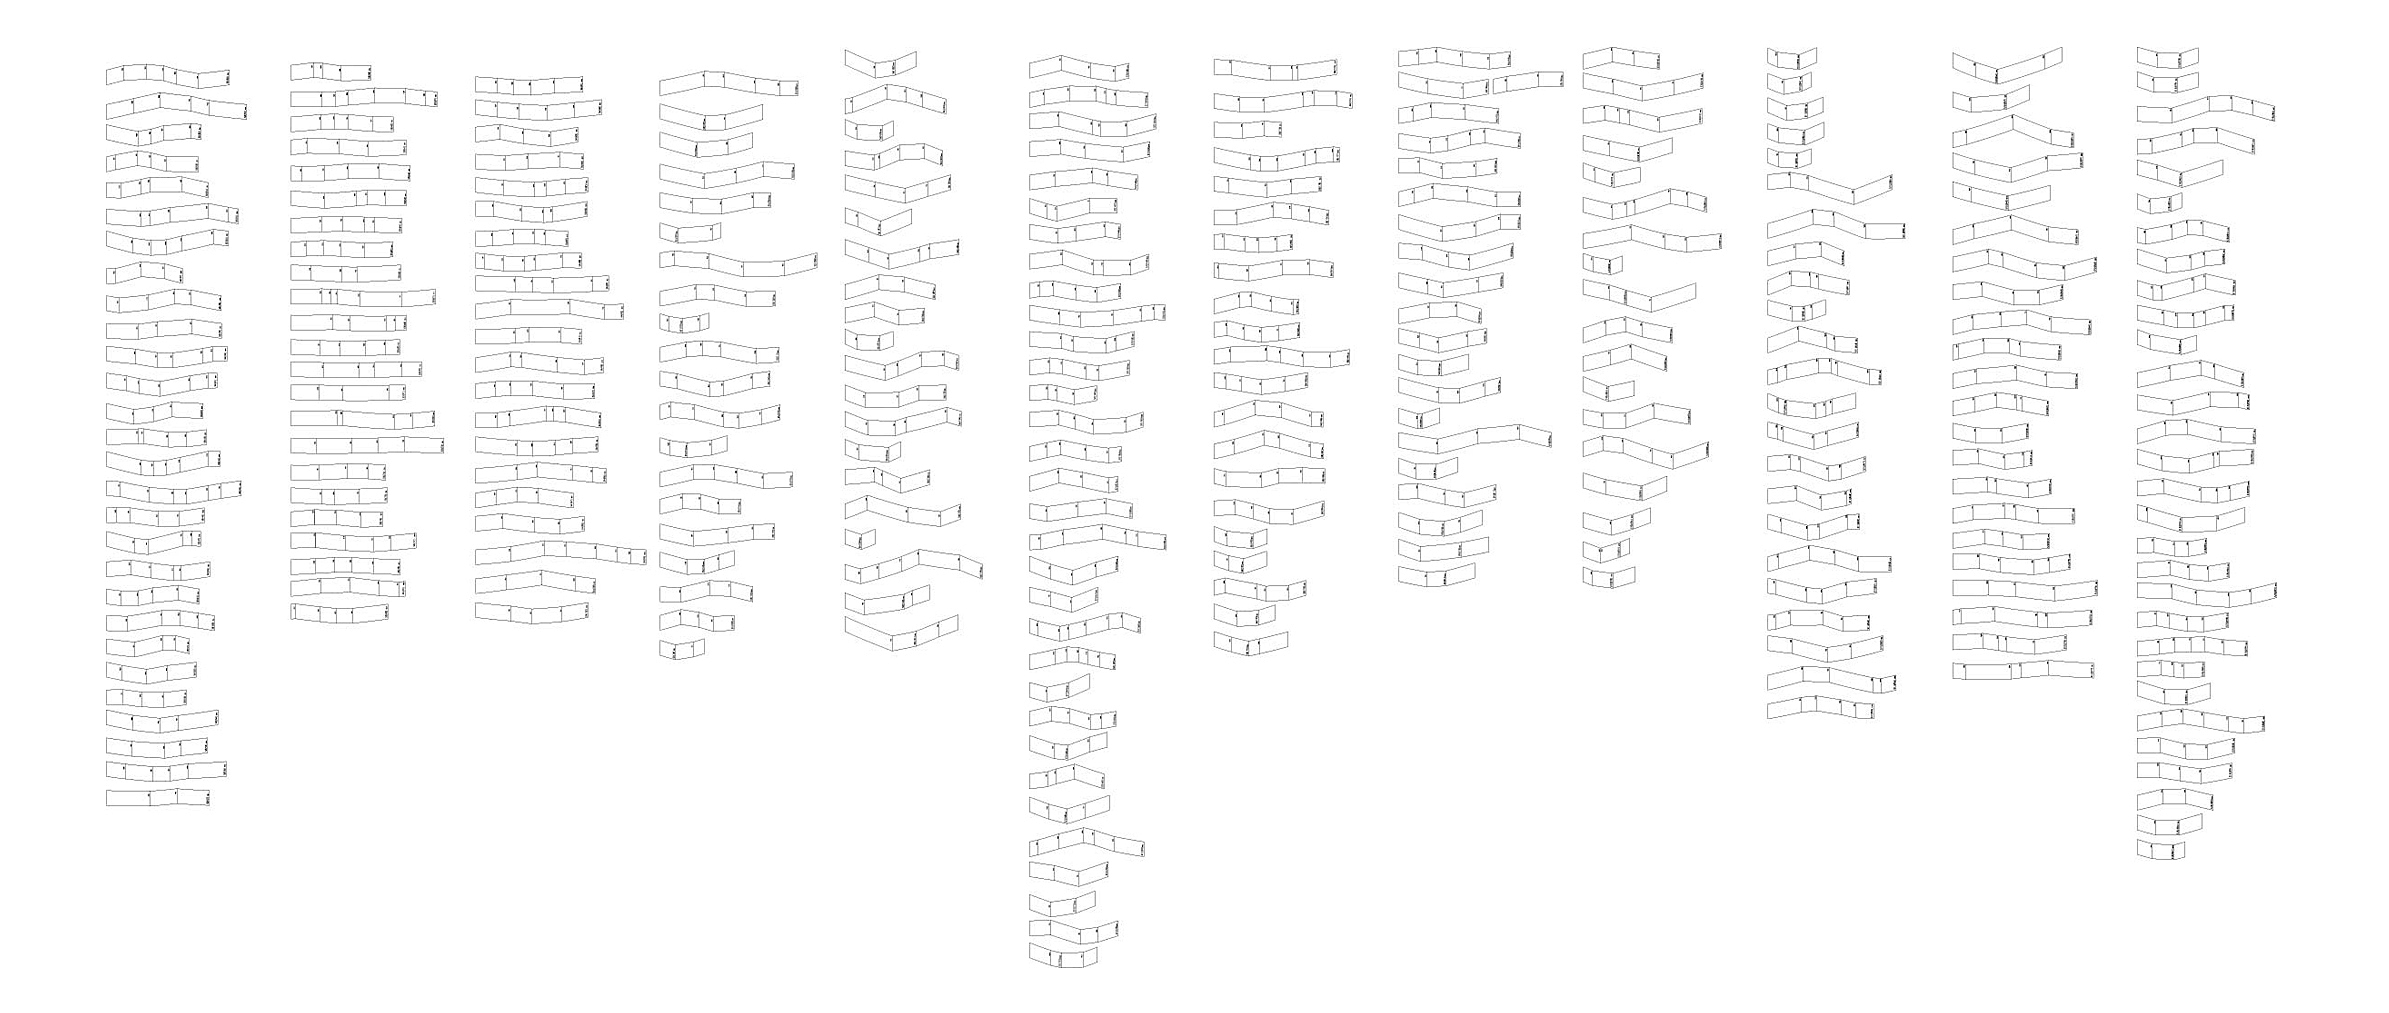 Leaf Cell 3 2014_0203_cells unrolled.jpg